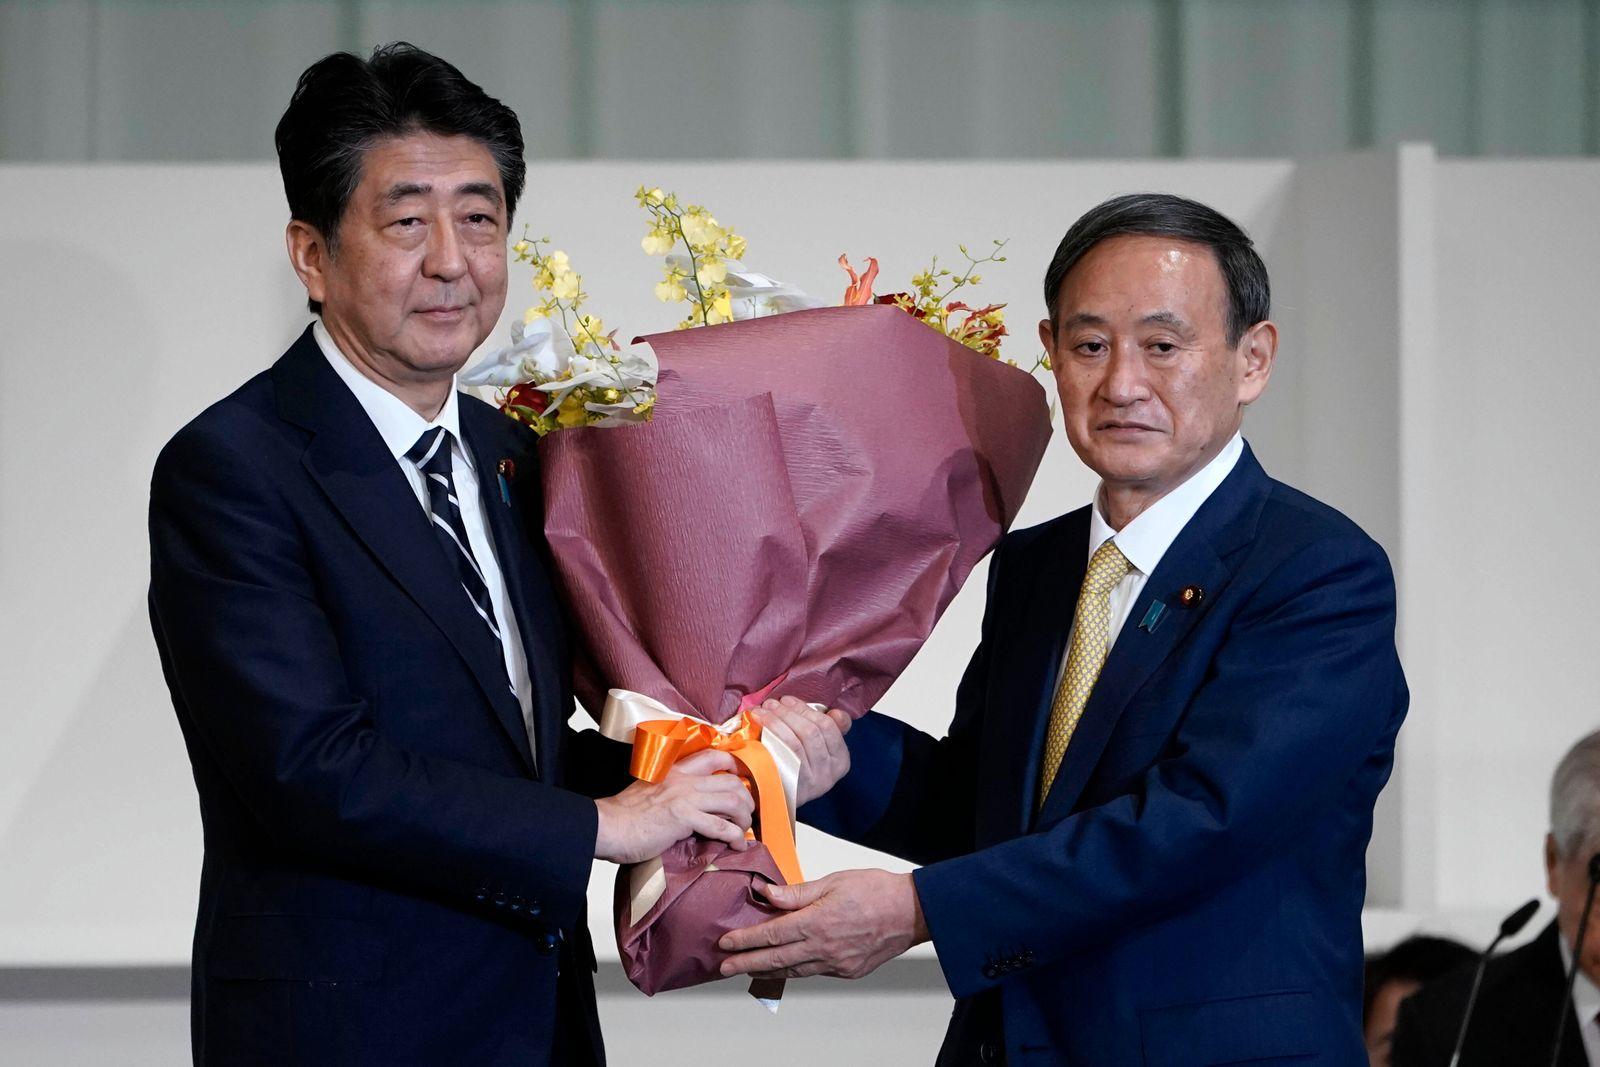 September 14, 2020, Tokyo, JPN: Japan s Prime Minister Shinzo Abe, left, presents Chief Cabinet Secretary Yoshihide Sug